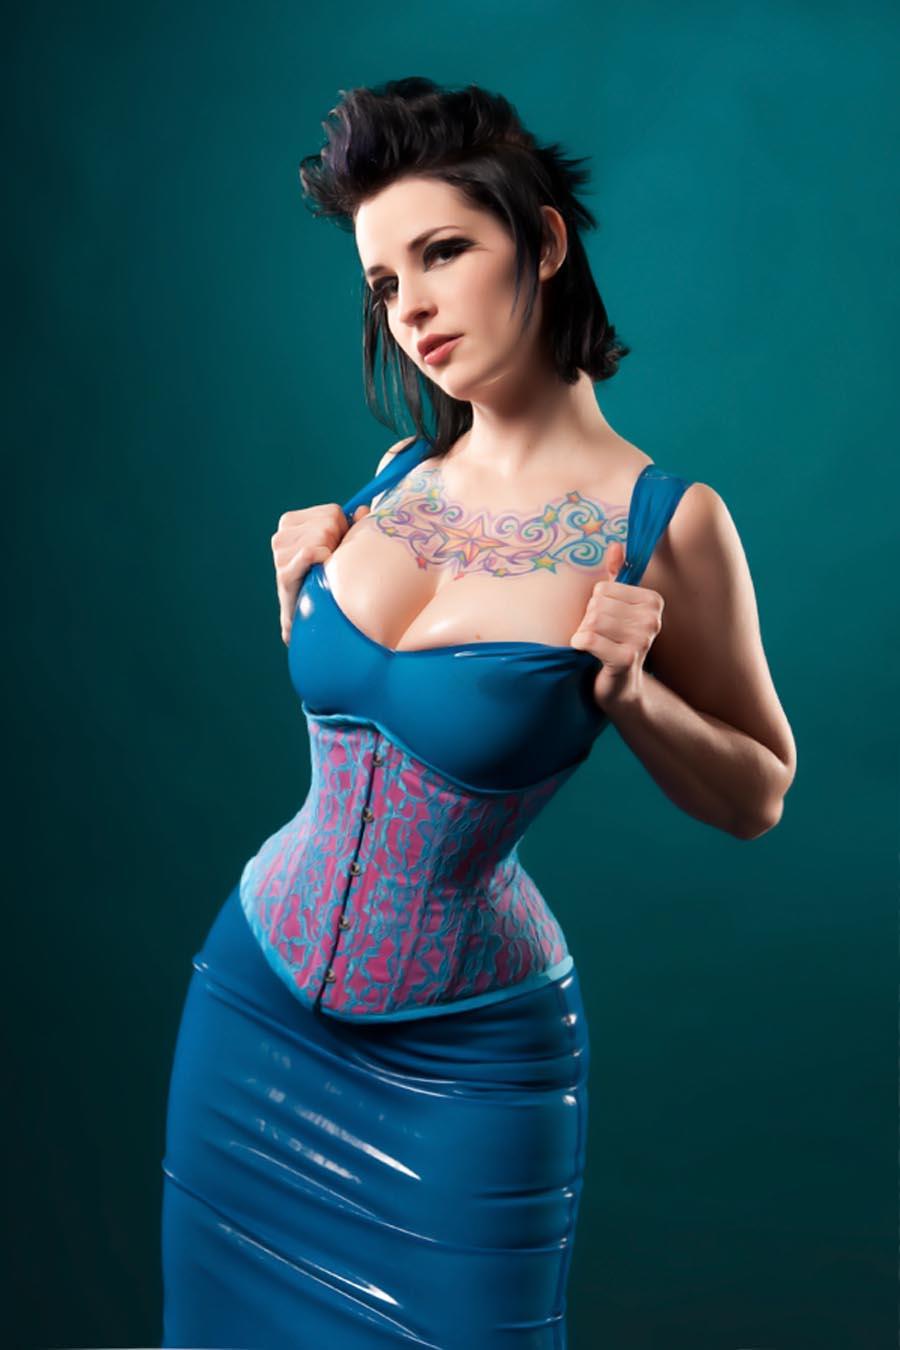 sexy+tight+corset+(62).jpg